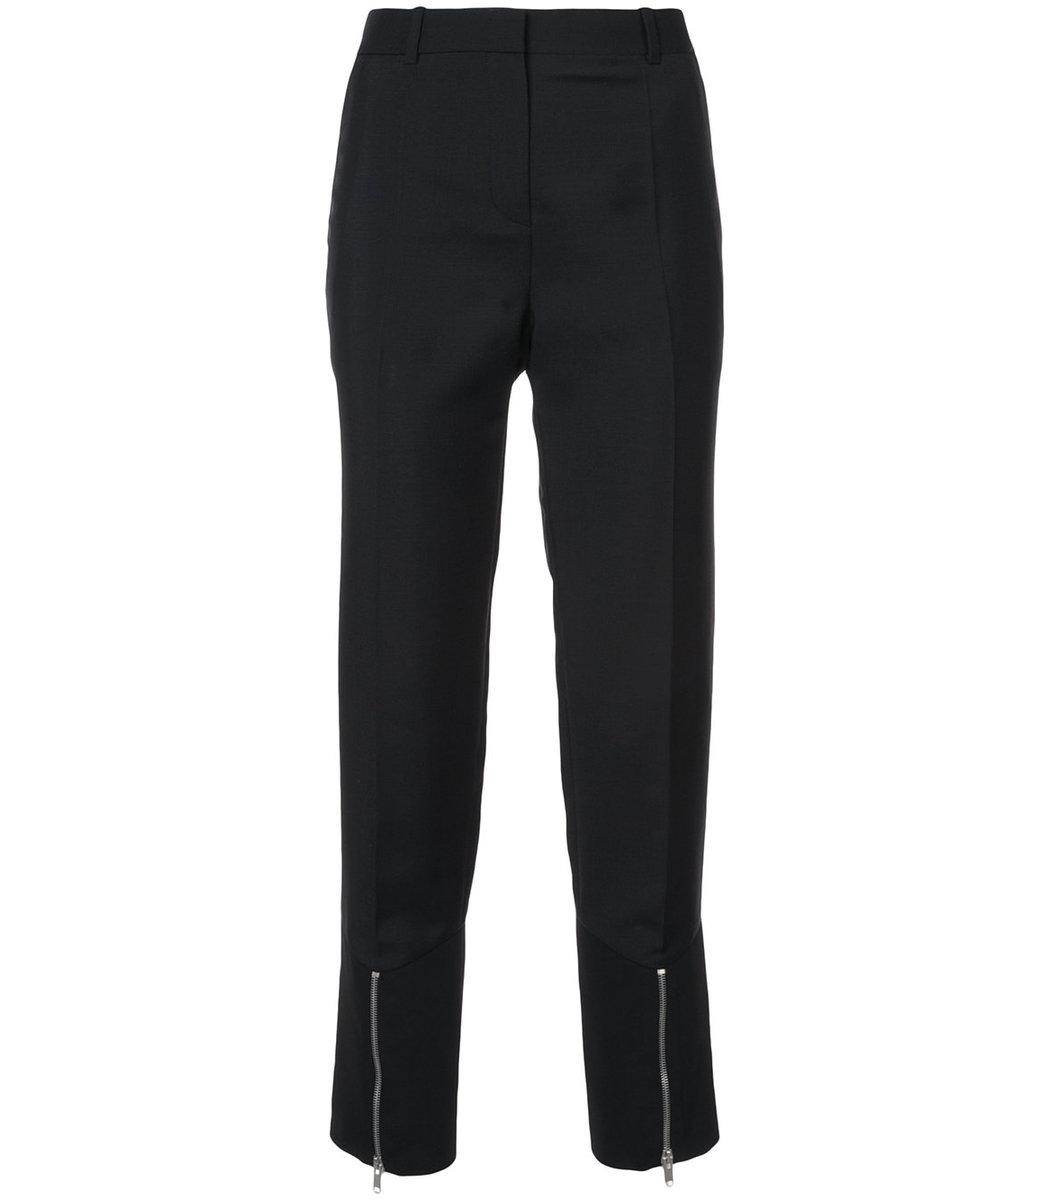 GIVENCHY Black Zipper Pants